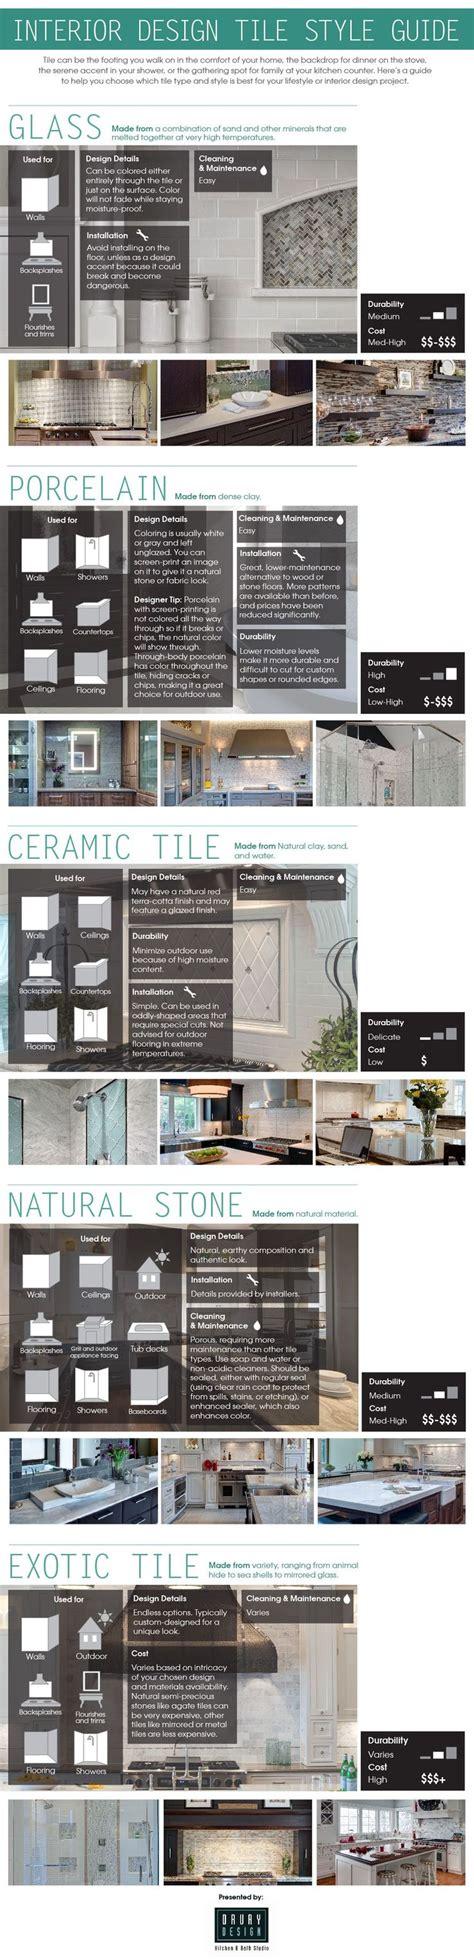 tips on interior design house plan interior design tips infographic best ideas on